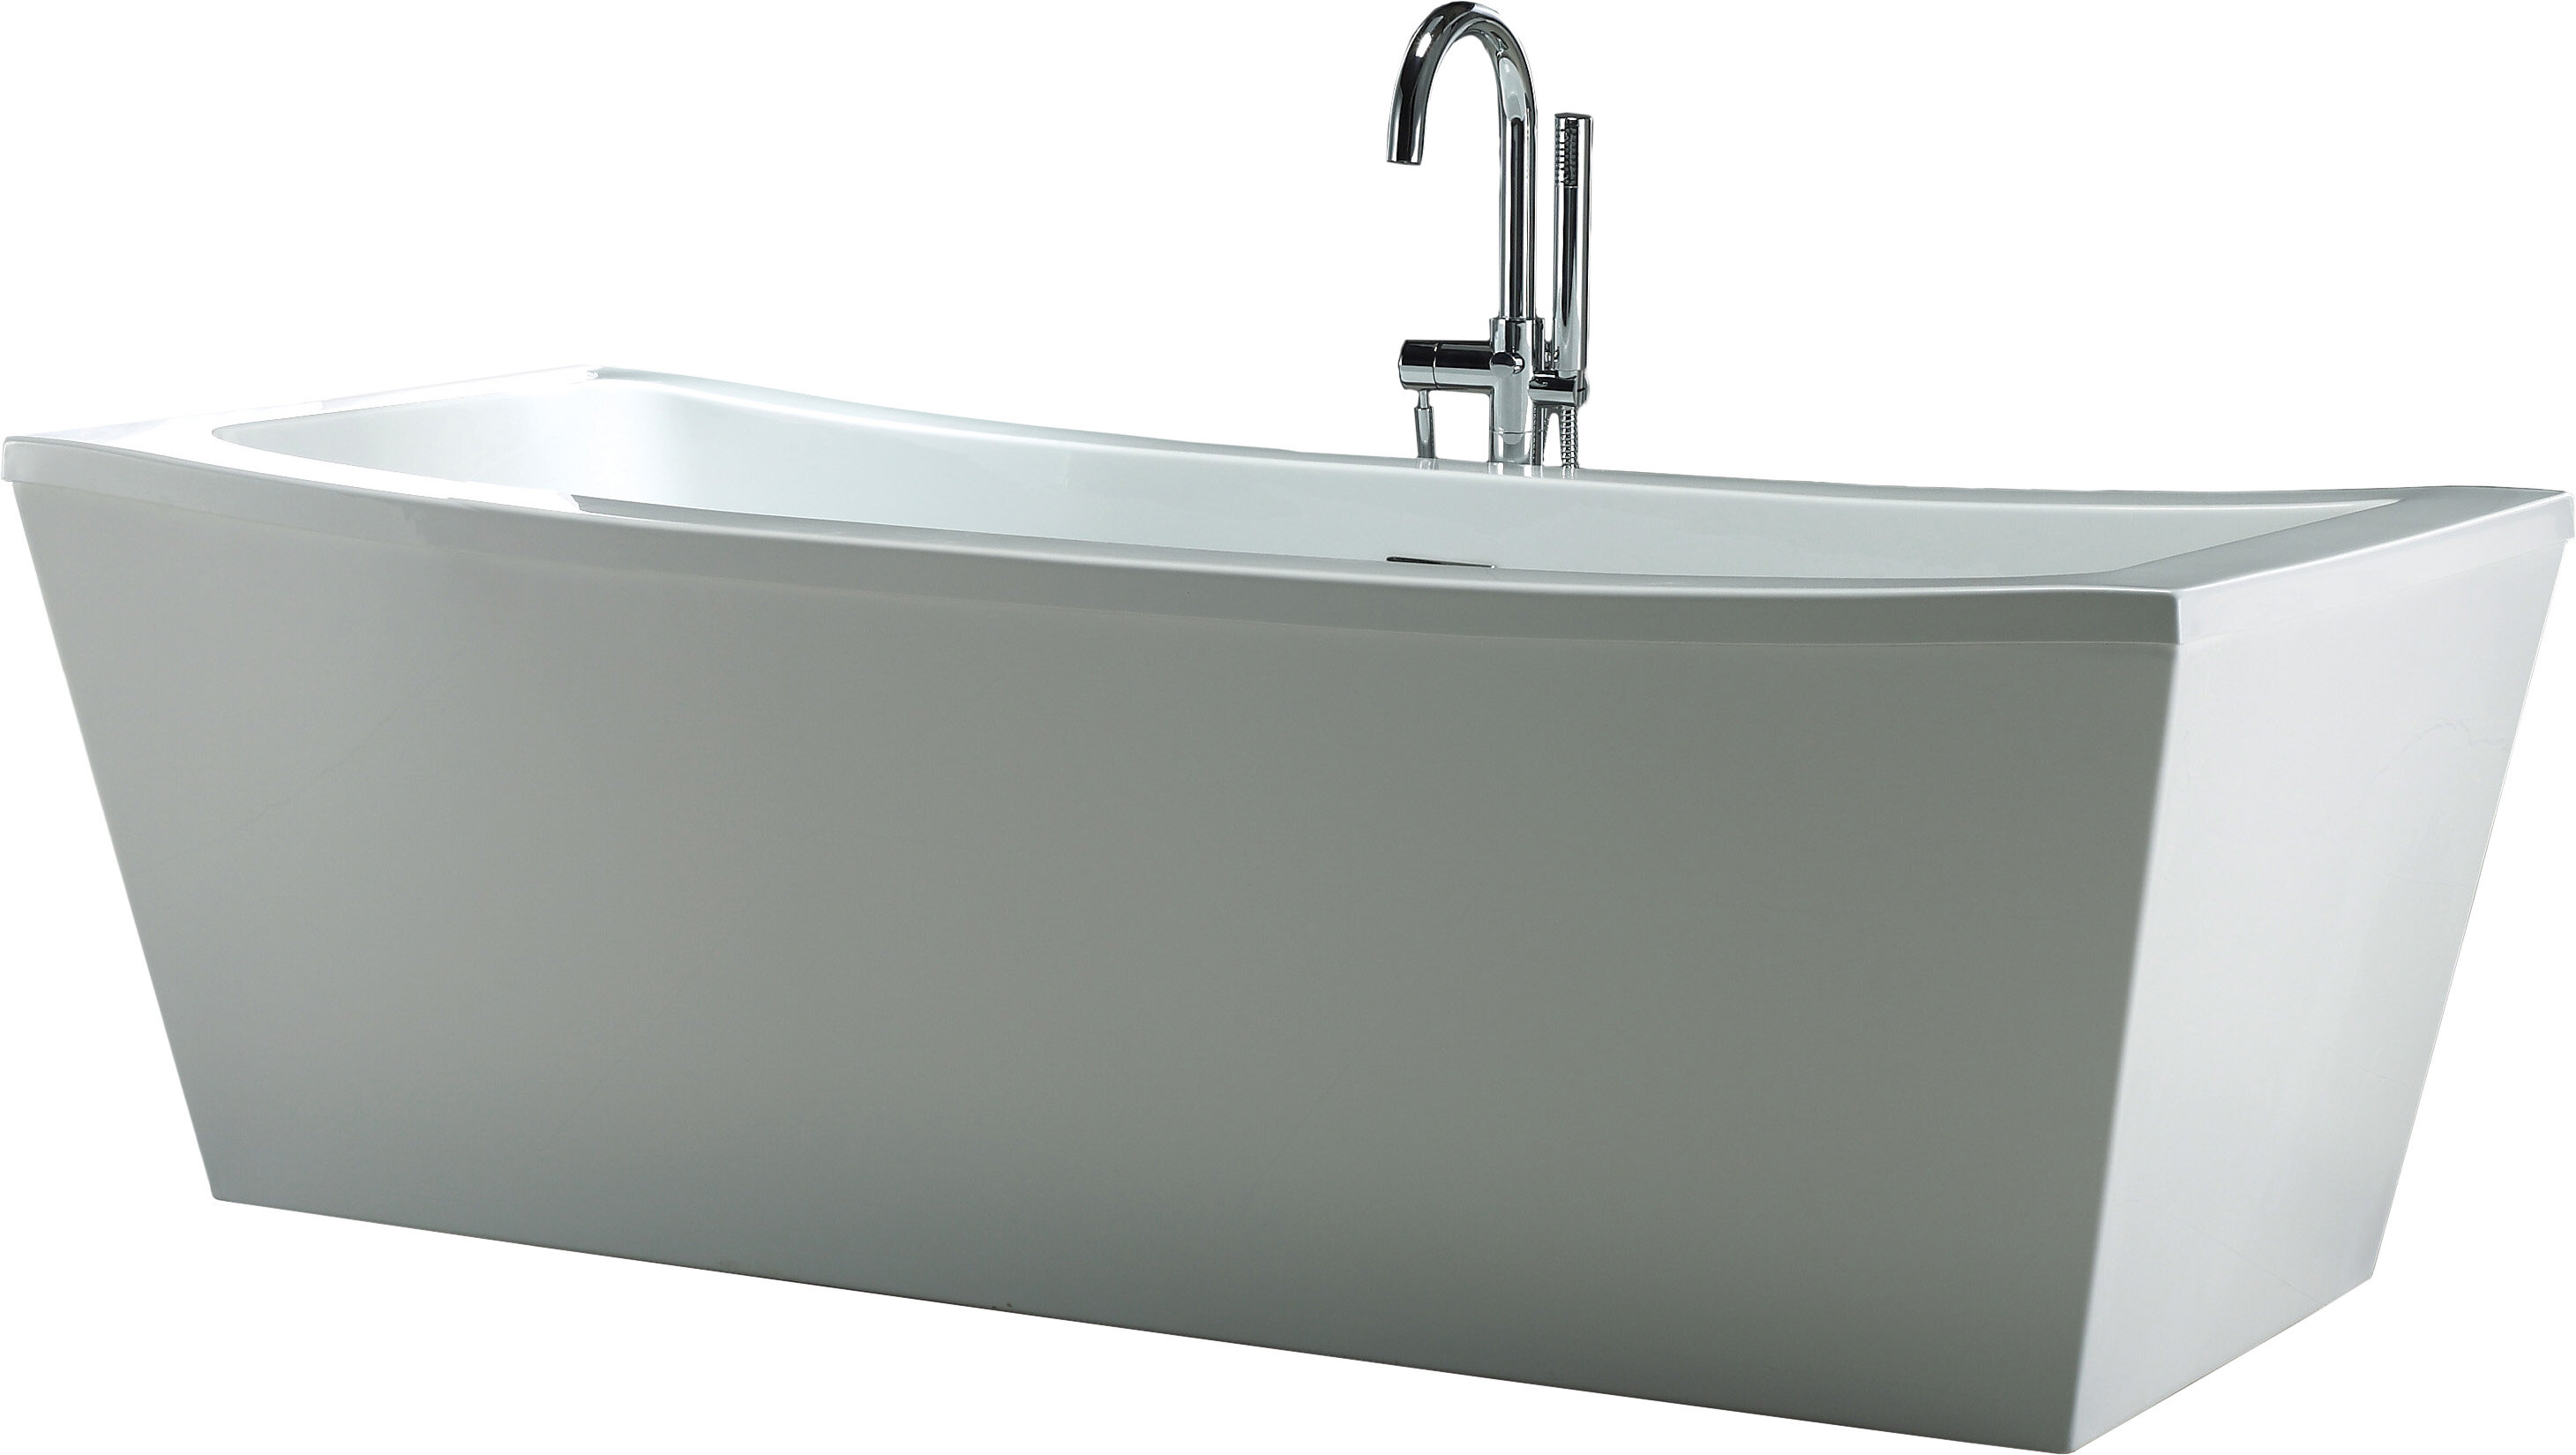 what of shower for standard ideas istandardize inhowerwalkhower showerstandard size tub sofa in photos appealing tiled sizesstandard ideasizewalk walk full sizewalk